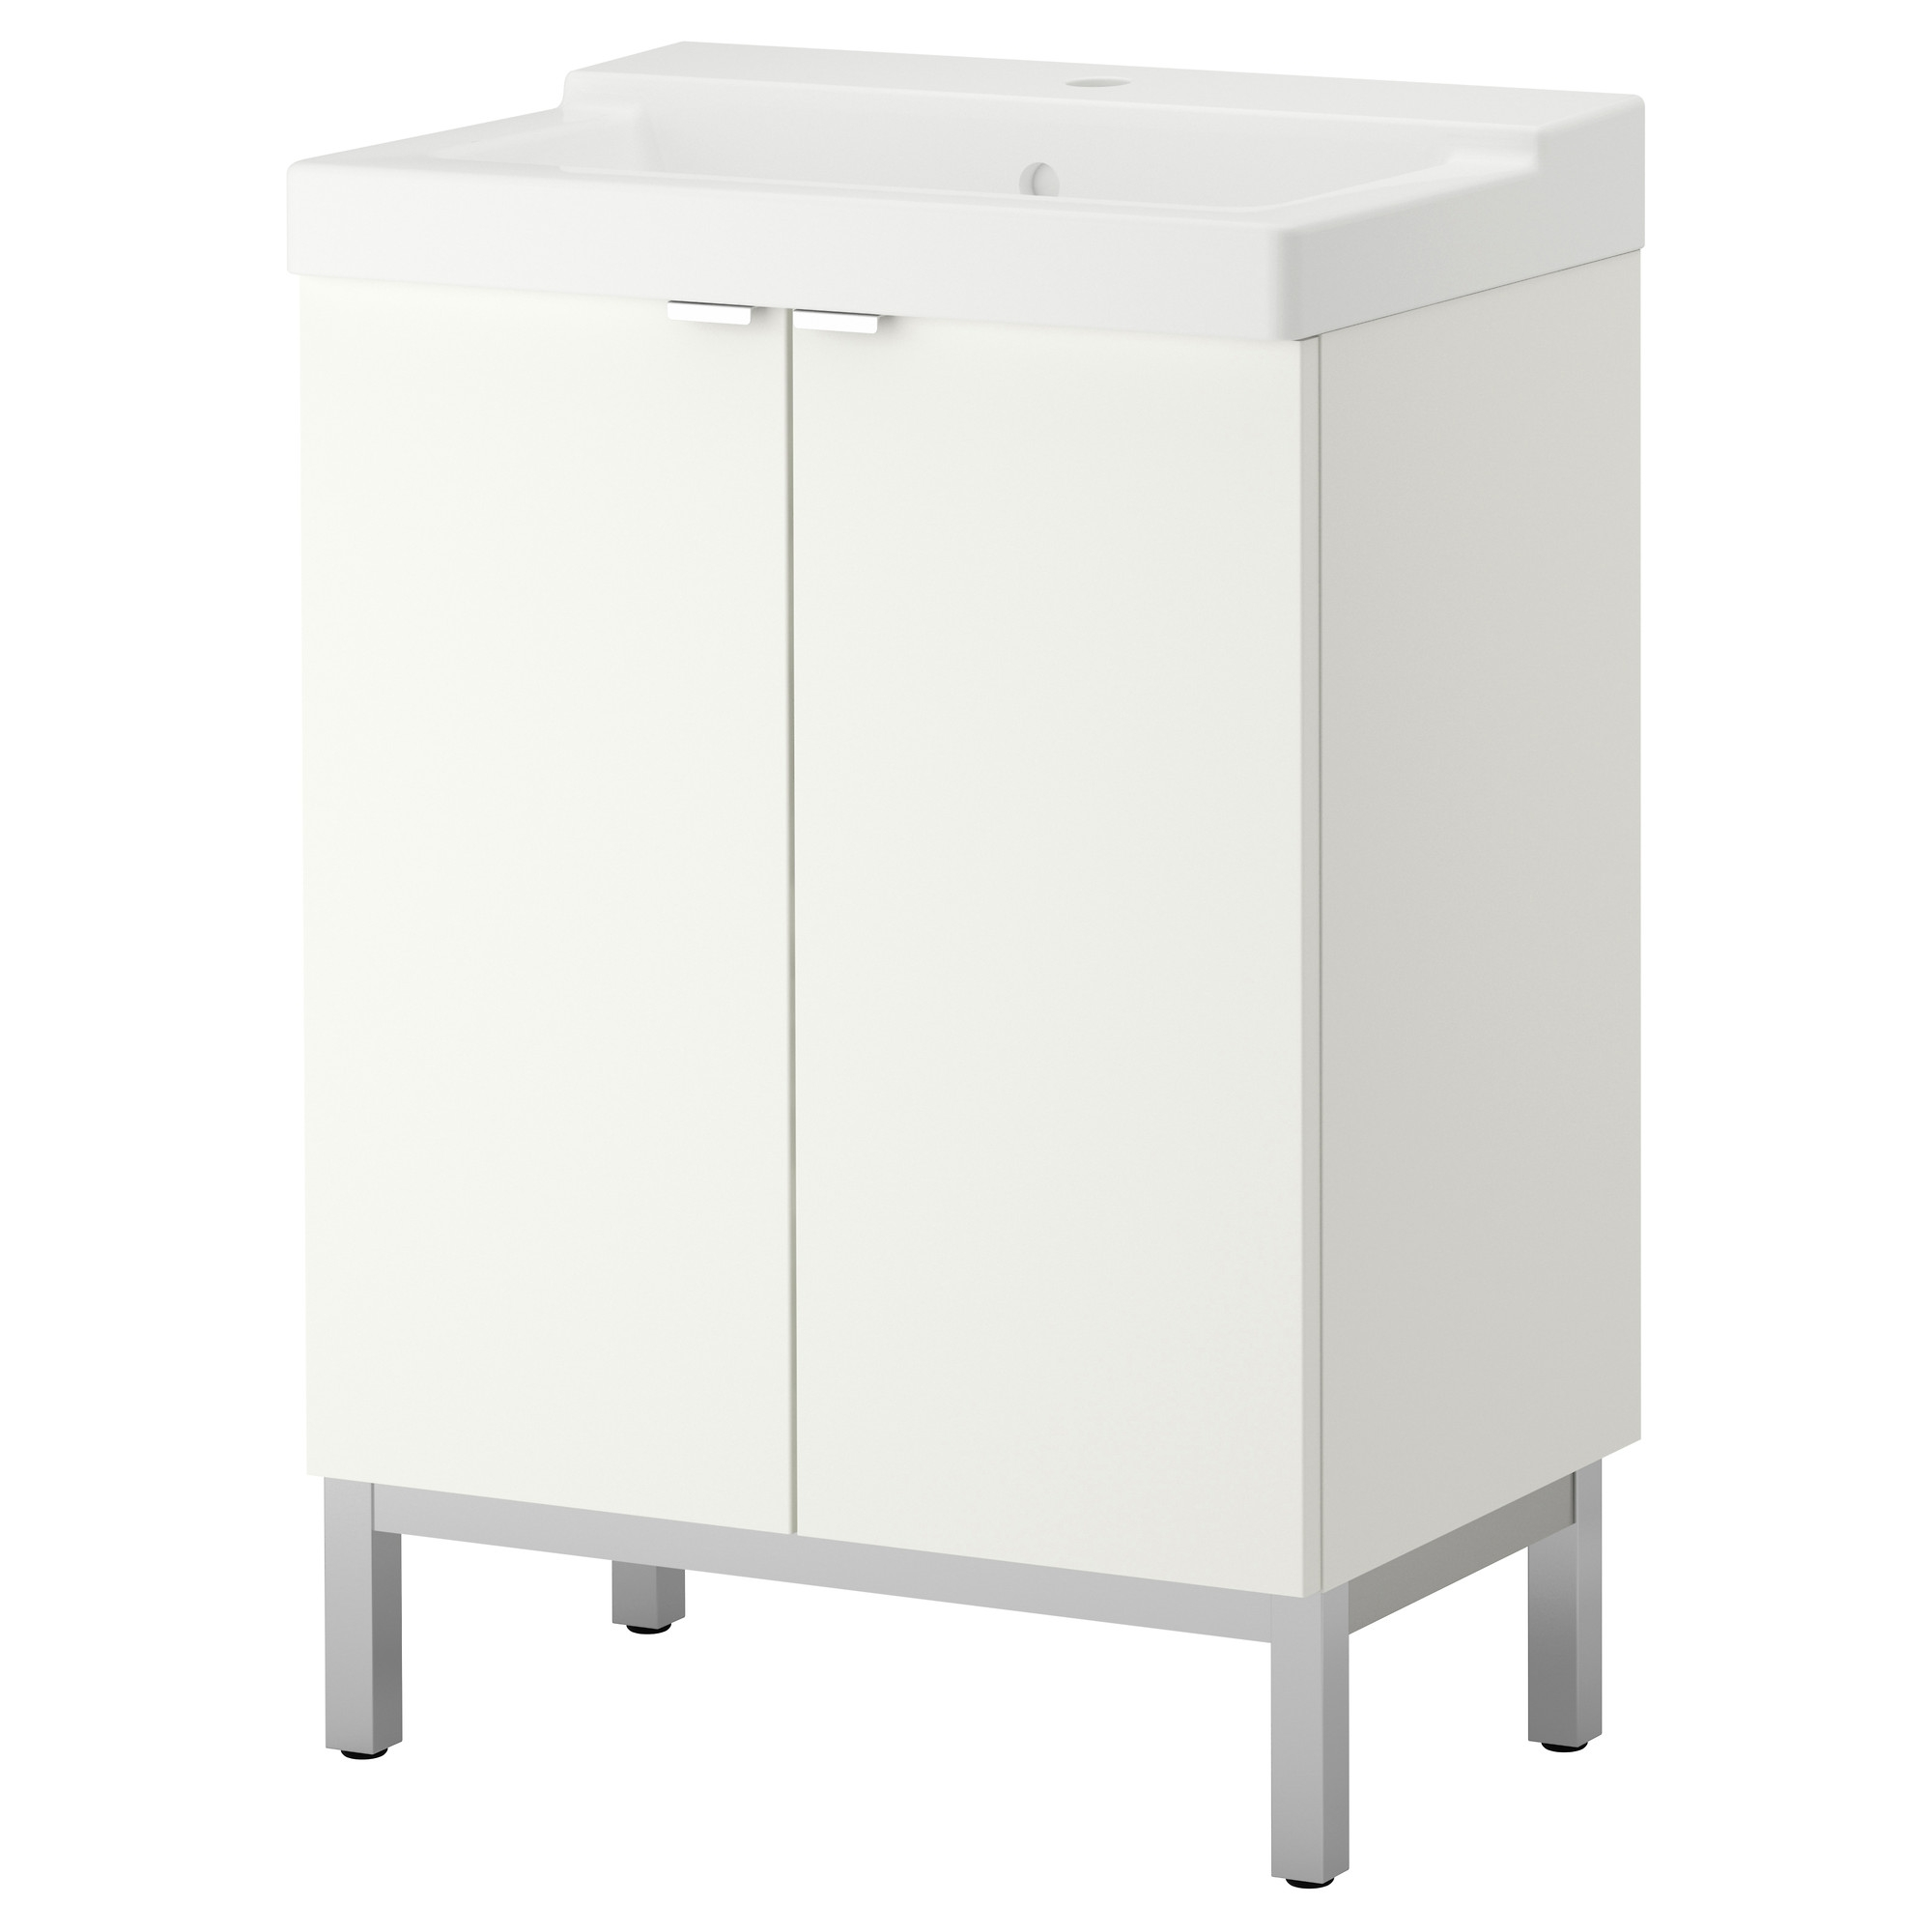 Lill ngen armario lavabo 2 pta - Armario lavabo ikea ...